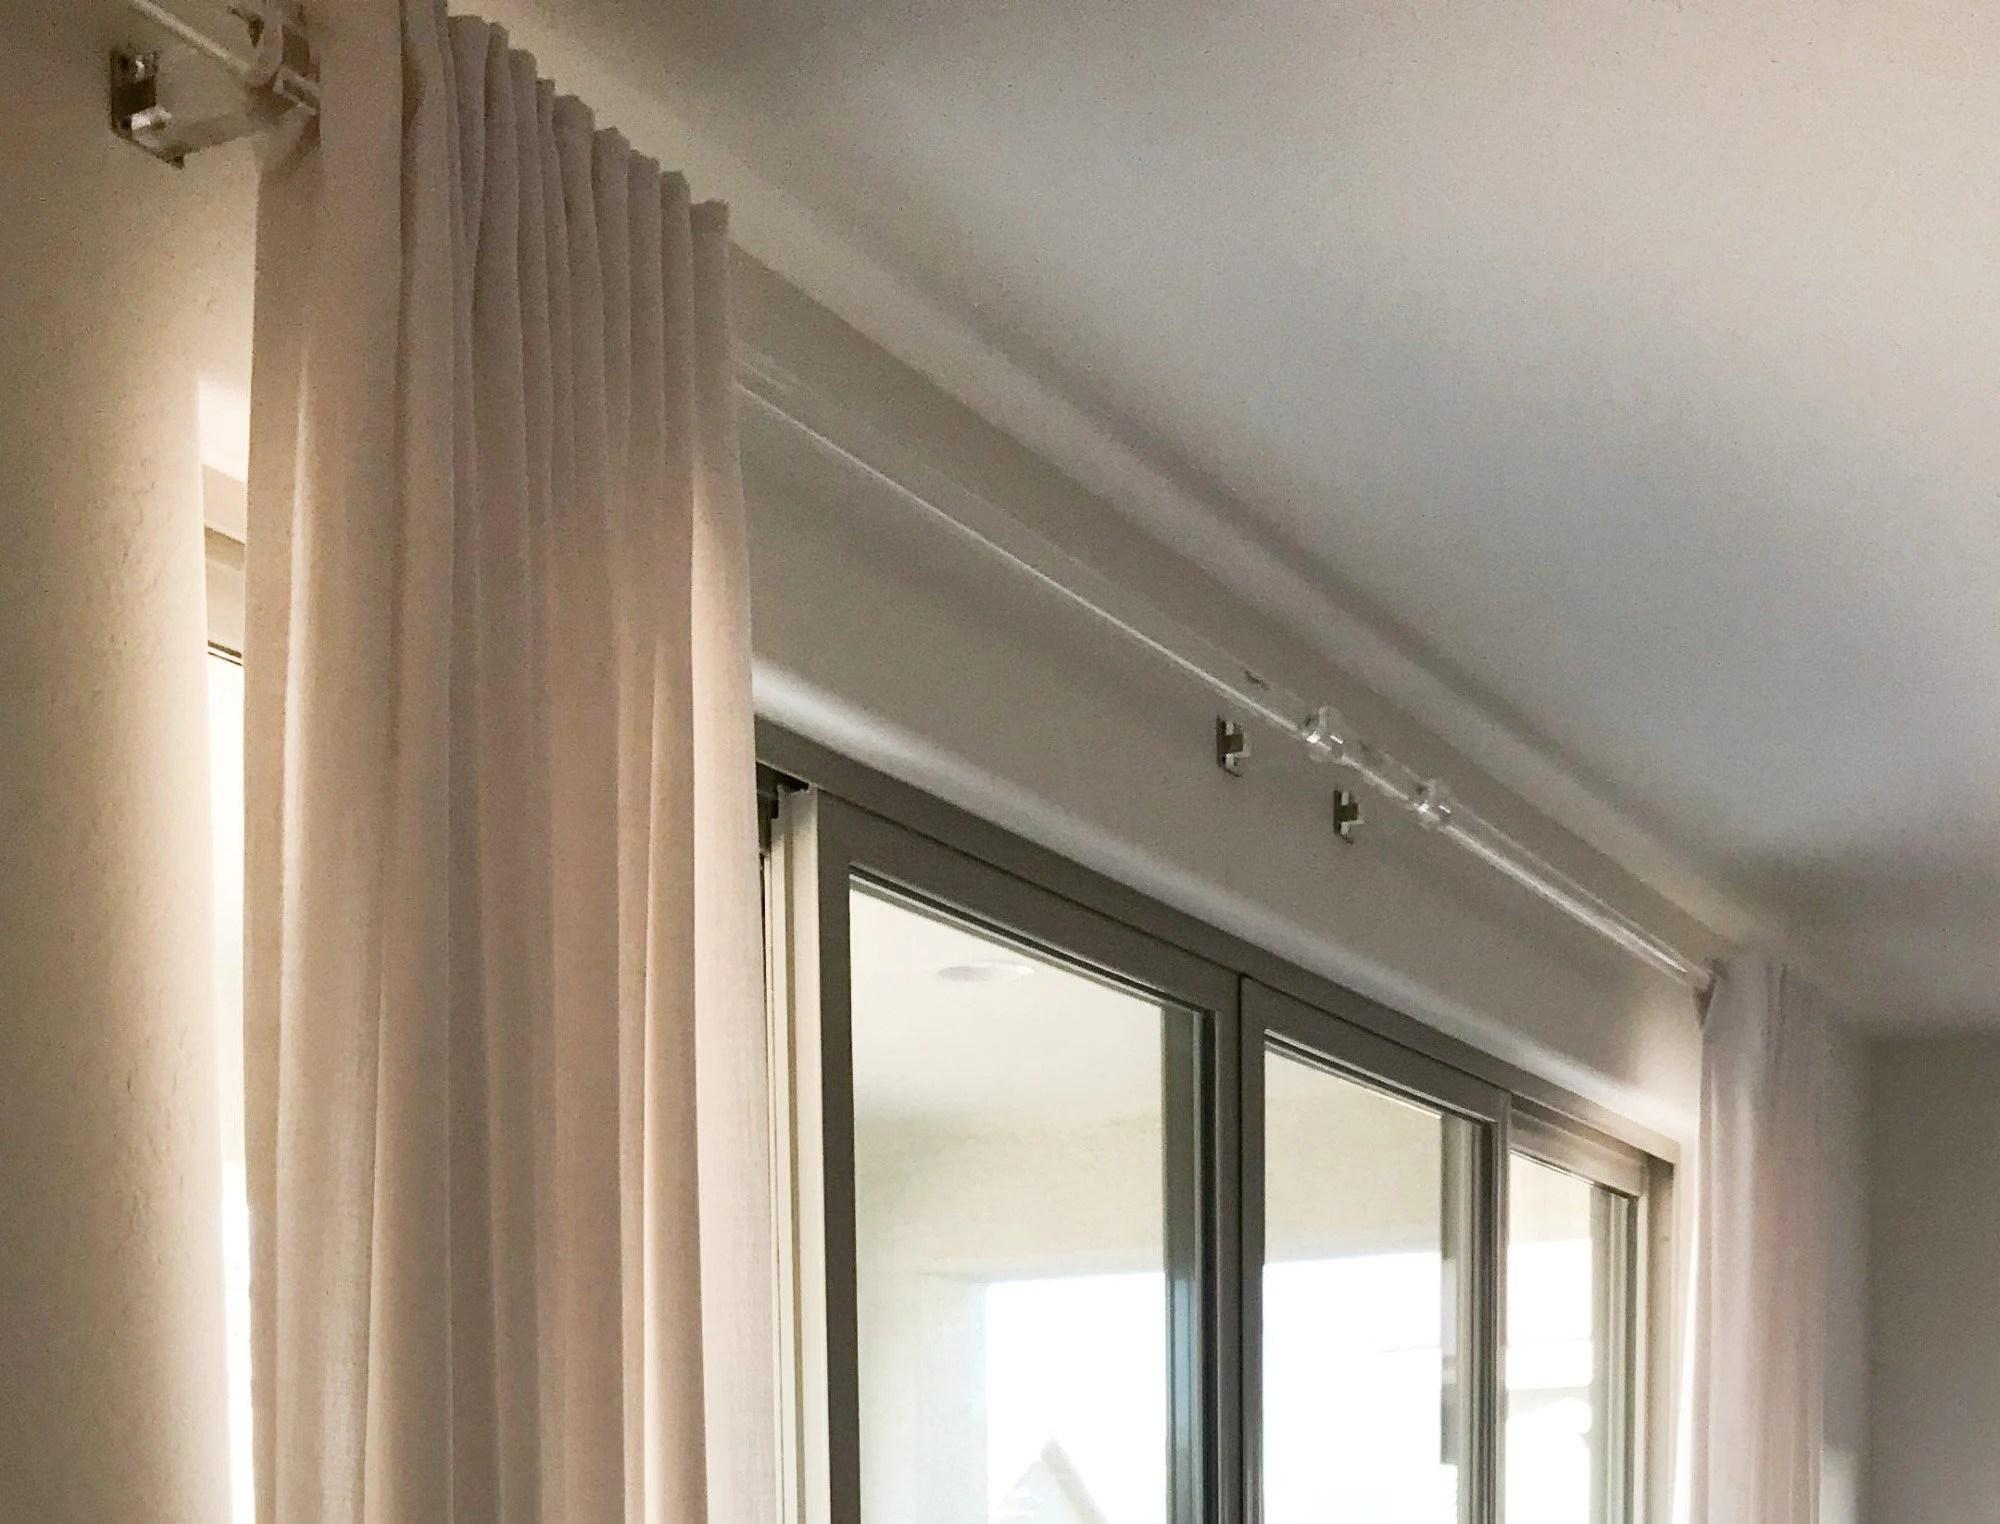 acrylic lucite curtain rod 1 3 8 inch diameter